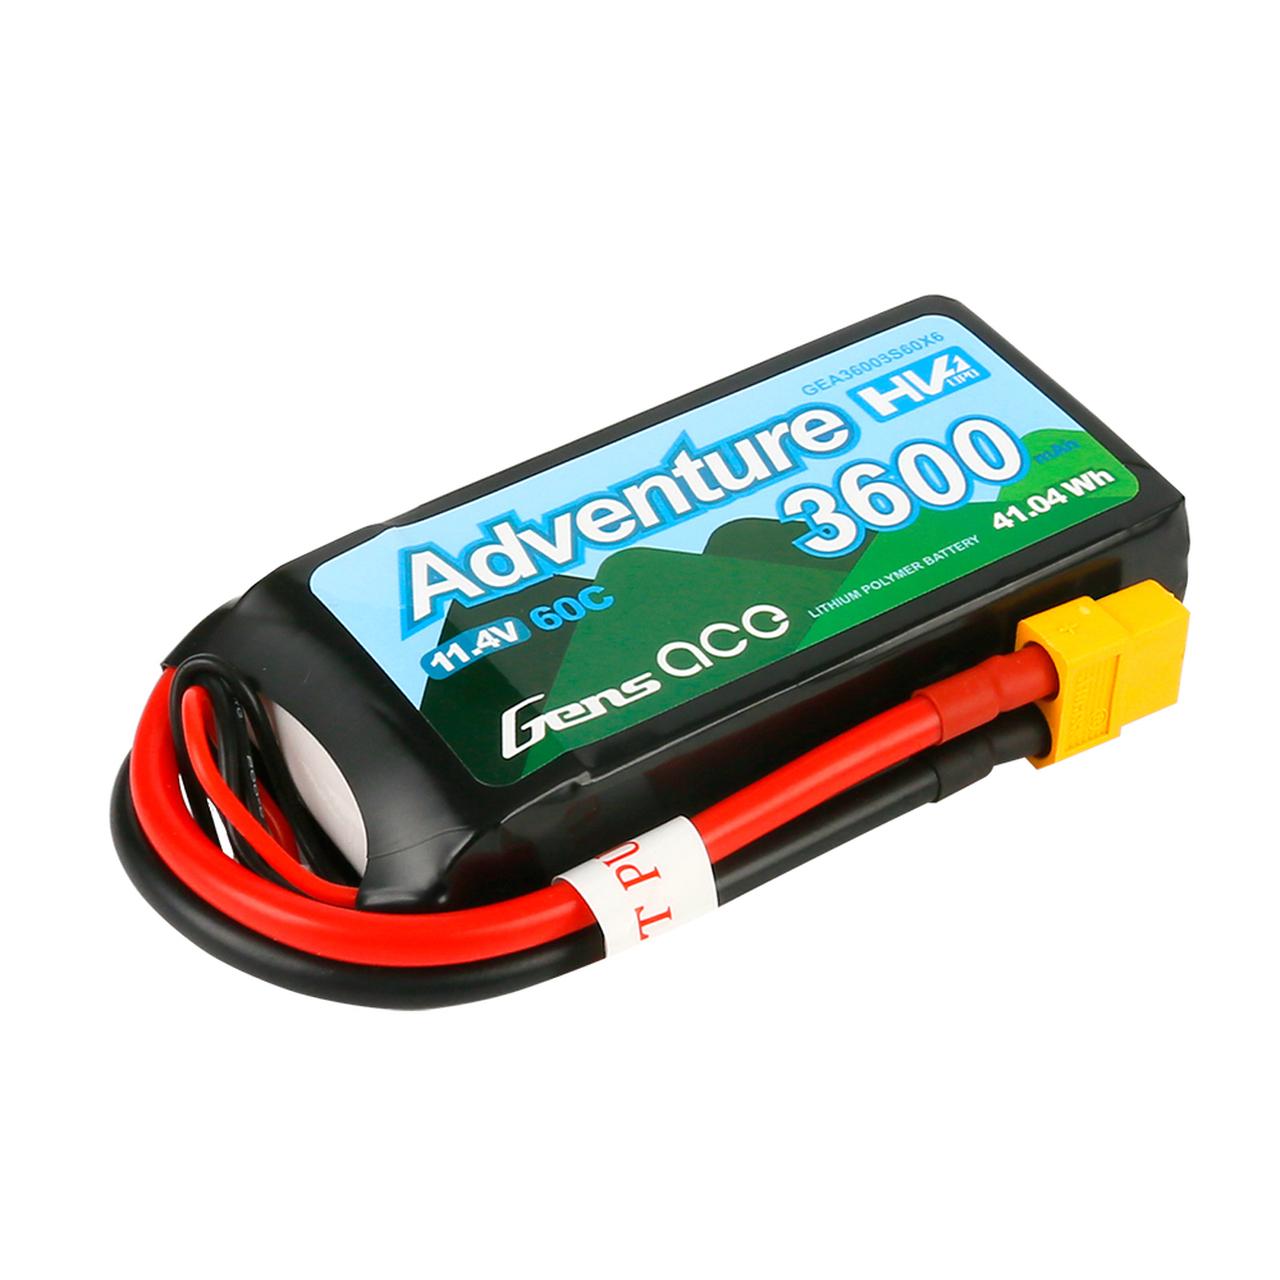 Gens Ace Adventure High Voltage 3600mAh 3S1P 11.4V 60C Lipo Battery with XT60 Plug